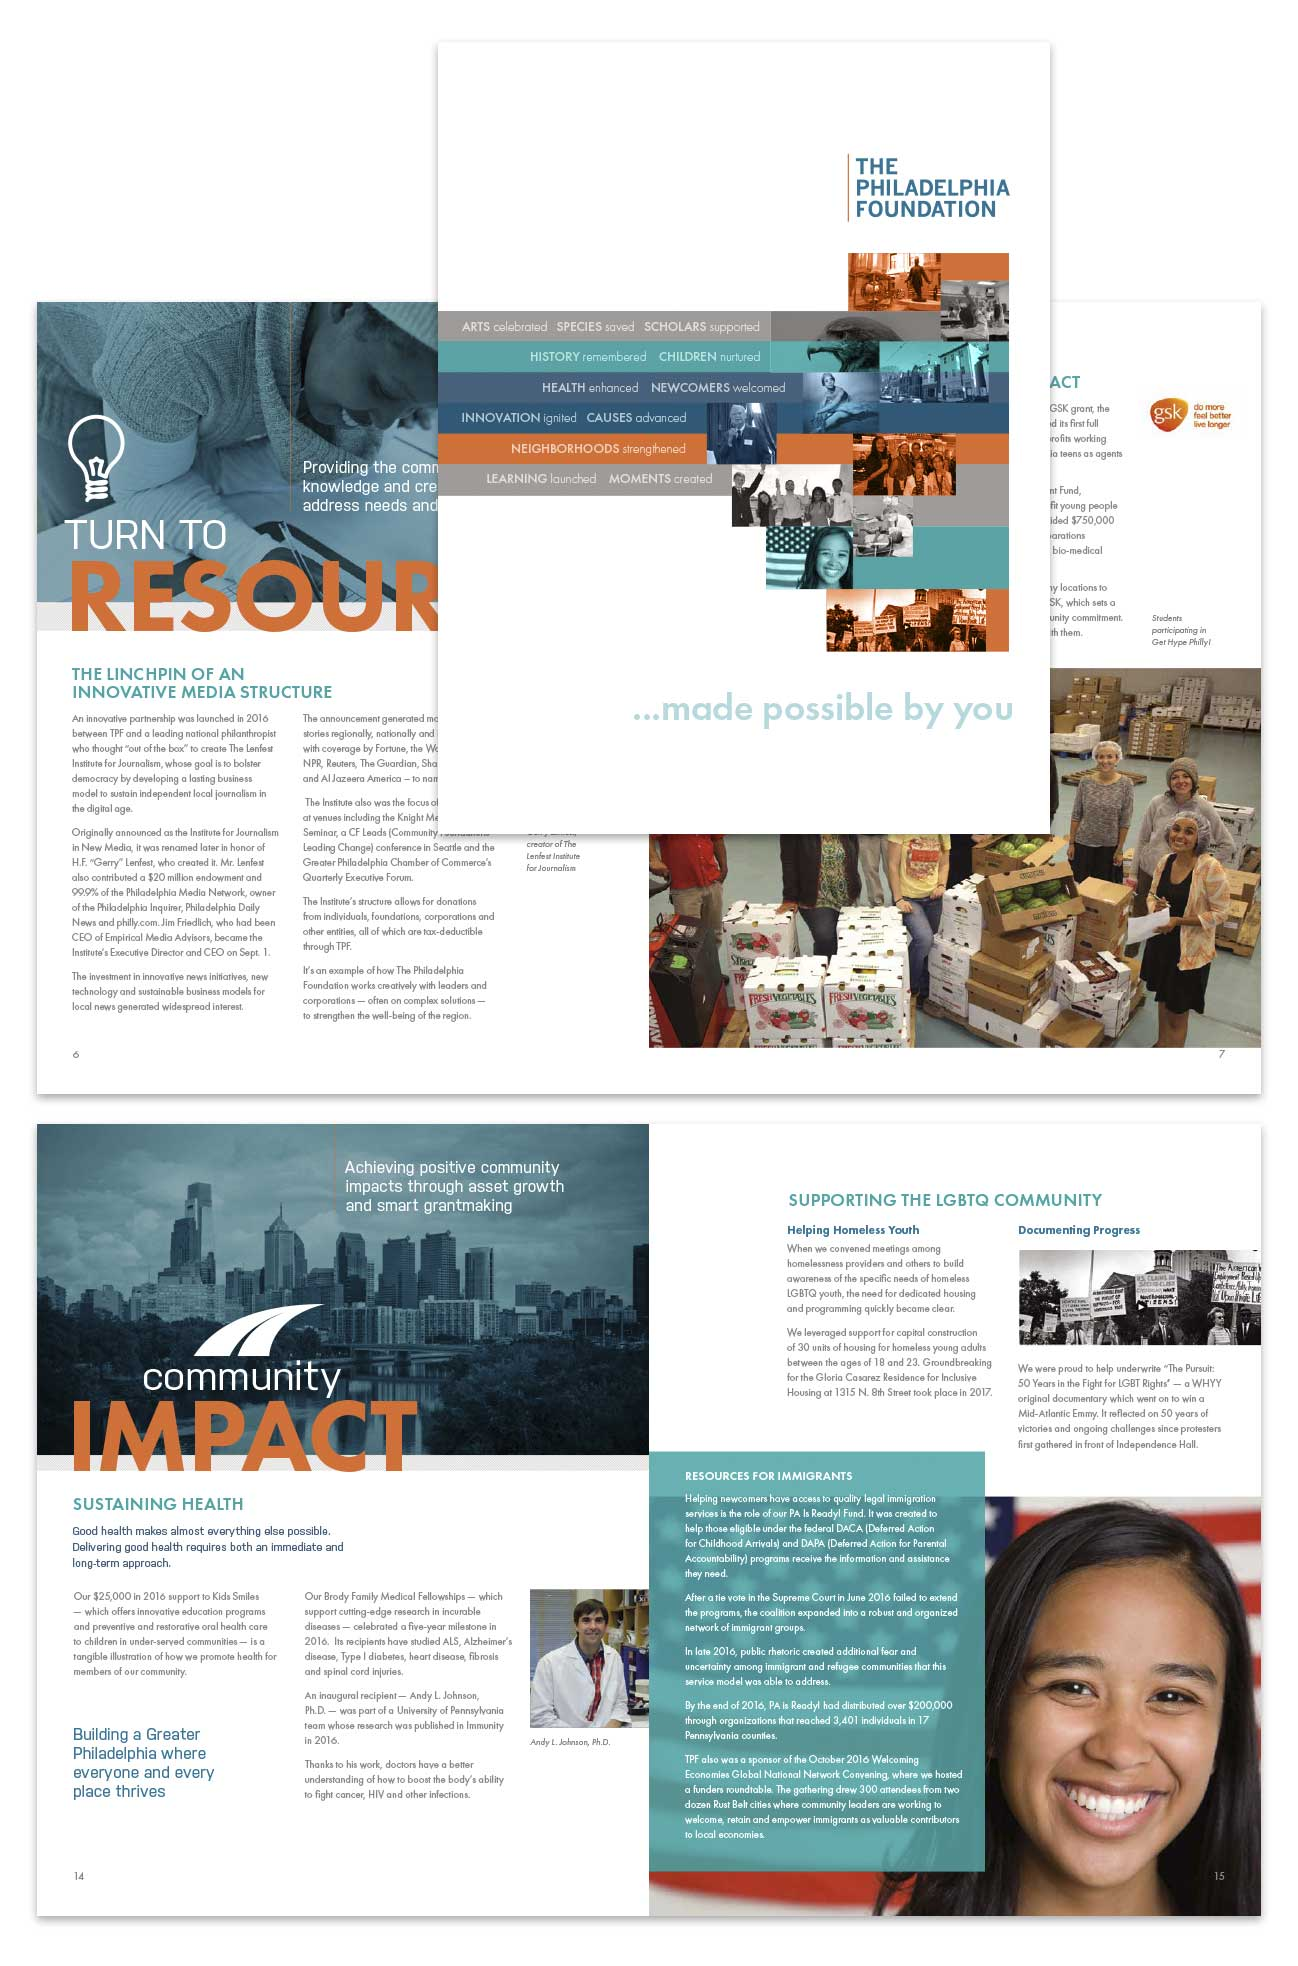 Annual report design for The Philadelphia Foundation